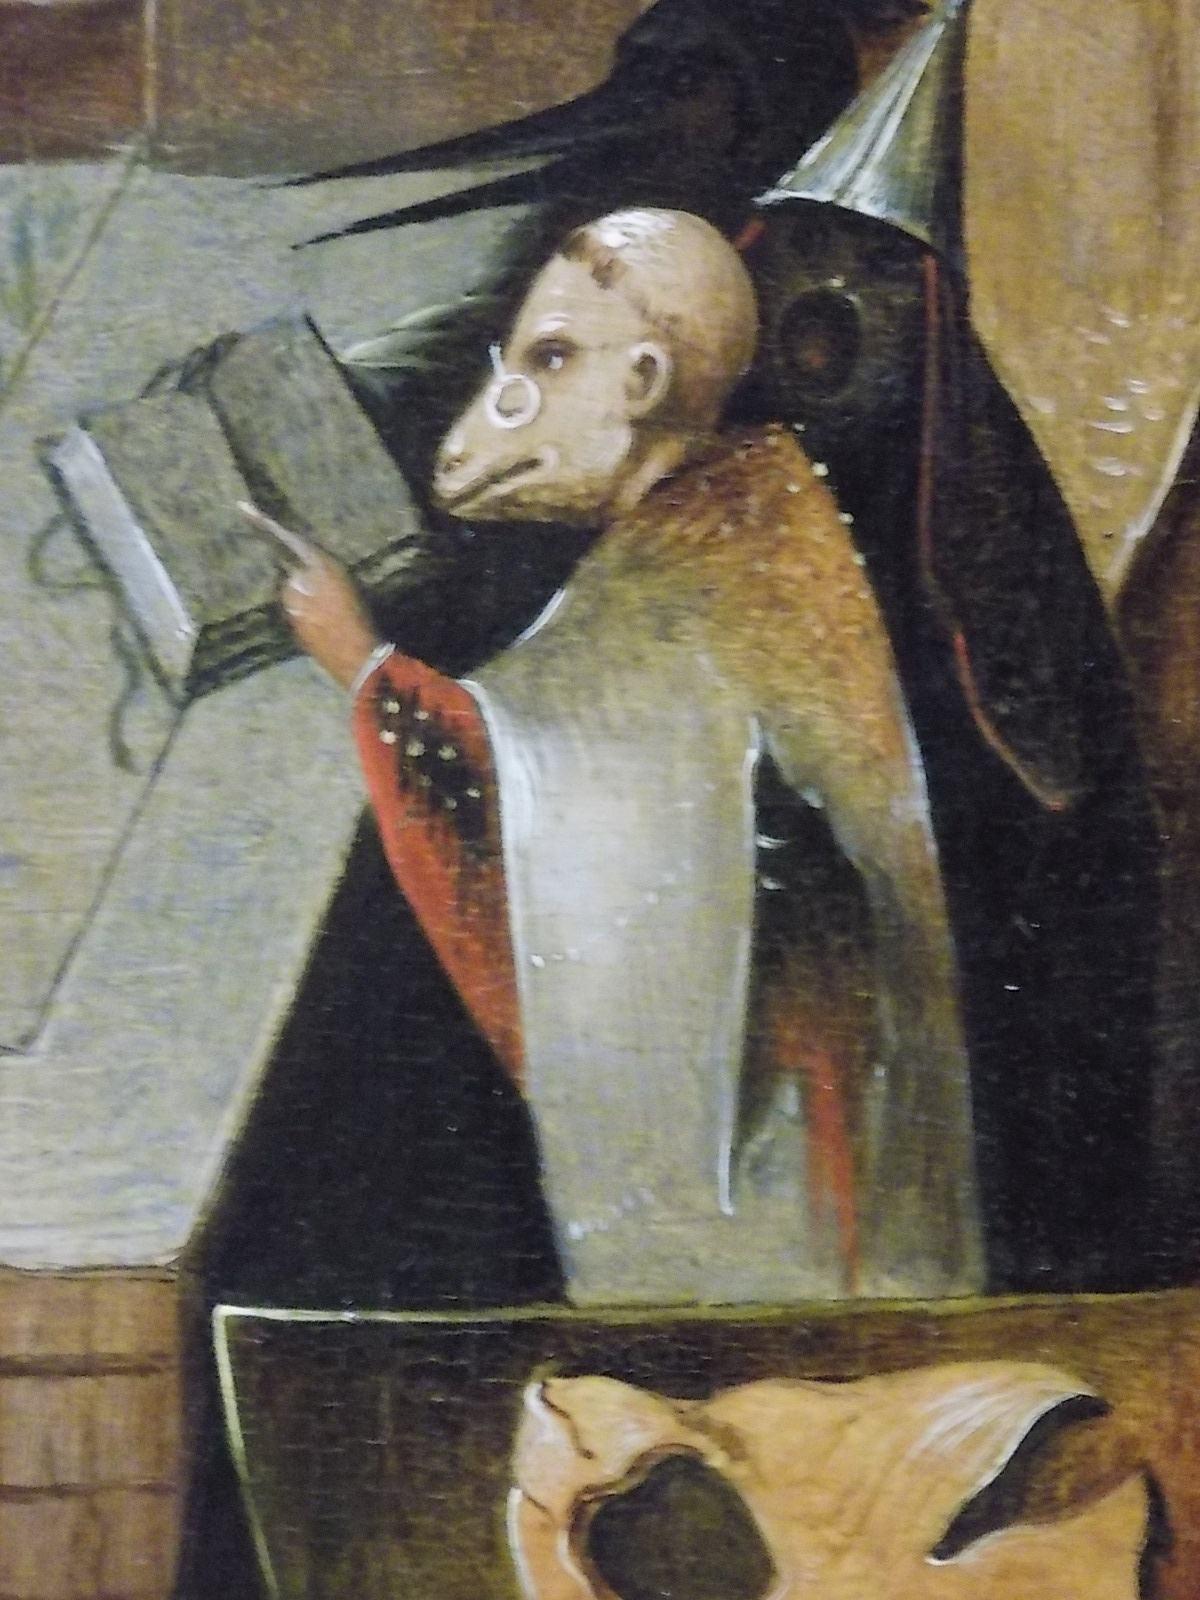 Detalhe de 'O Juízo Final', de Hieronymus Bosch